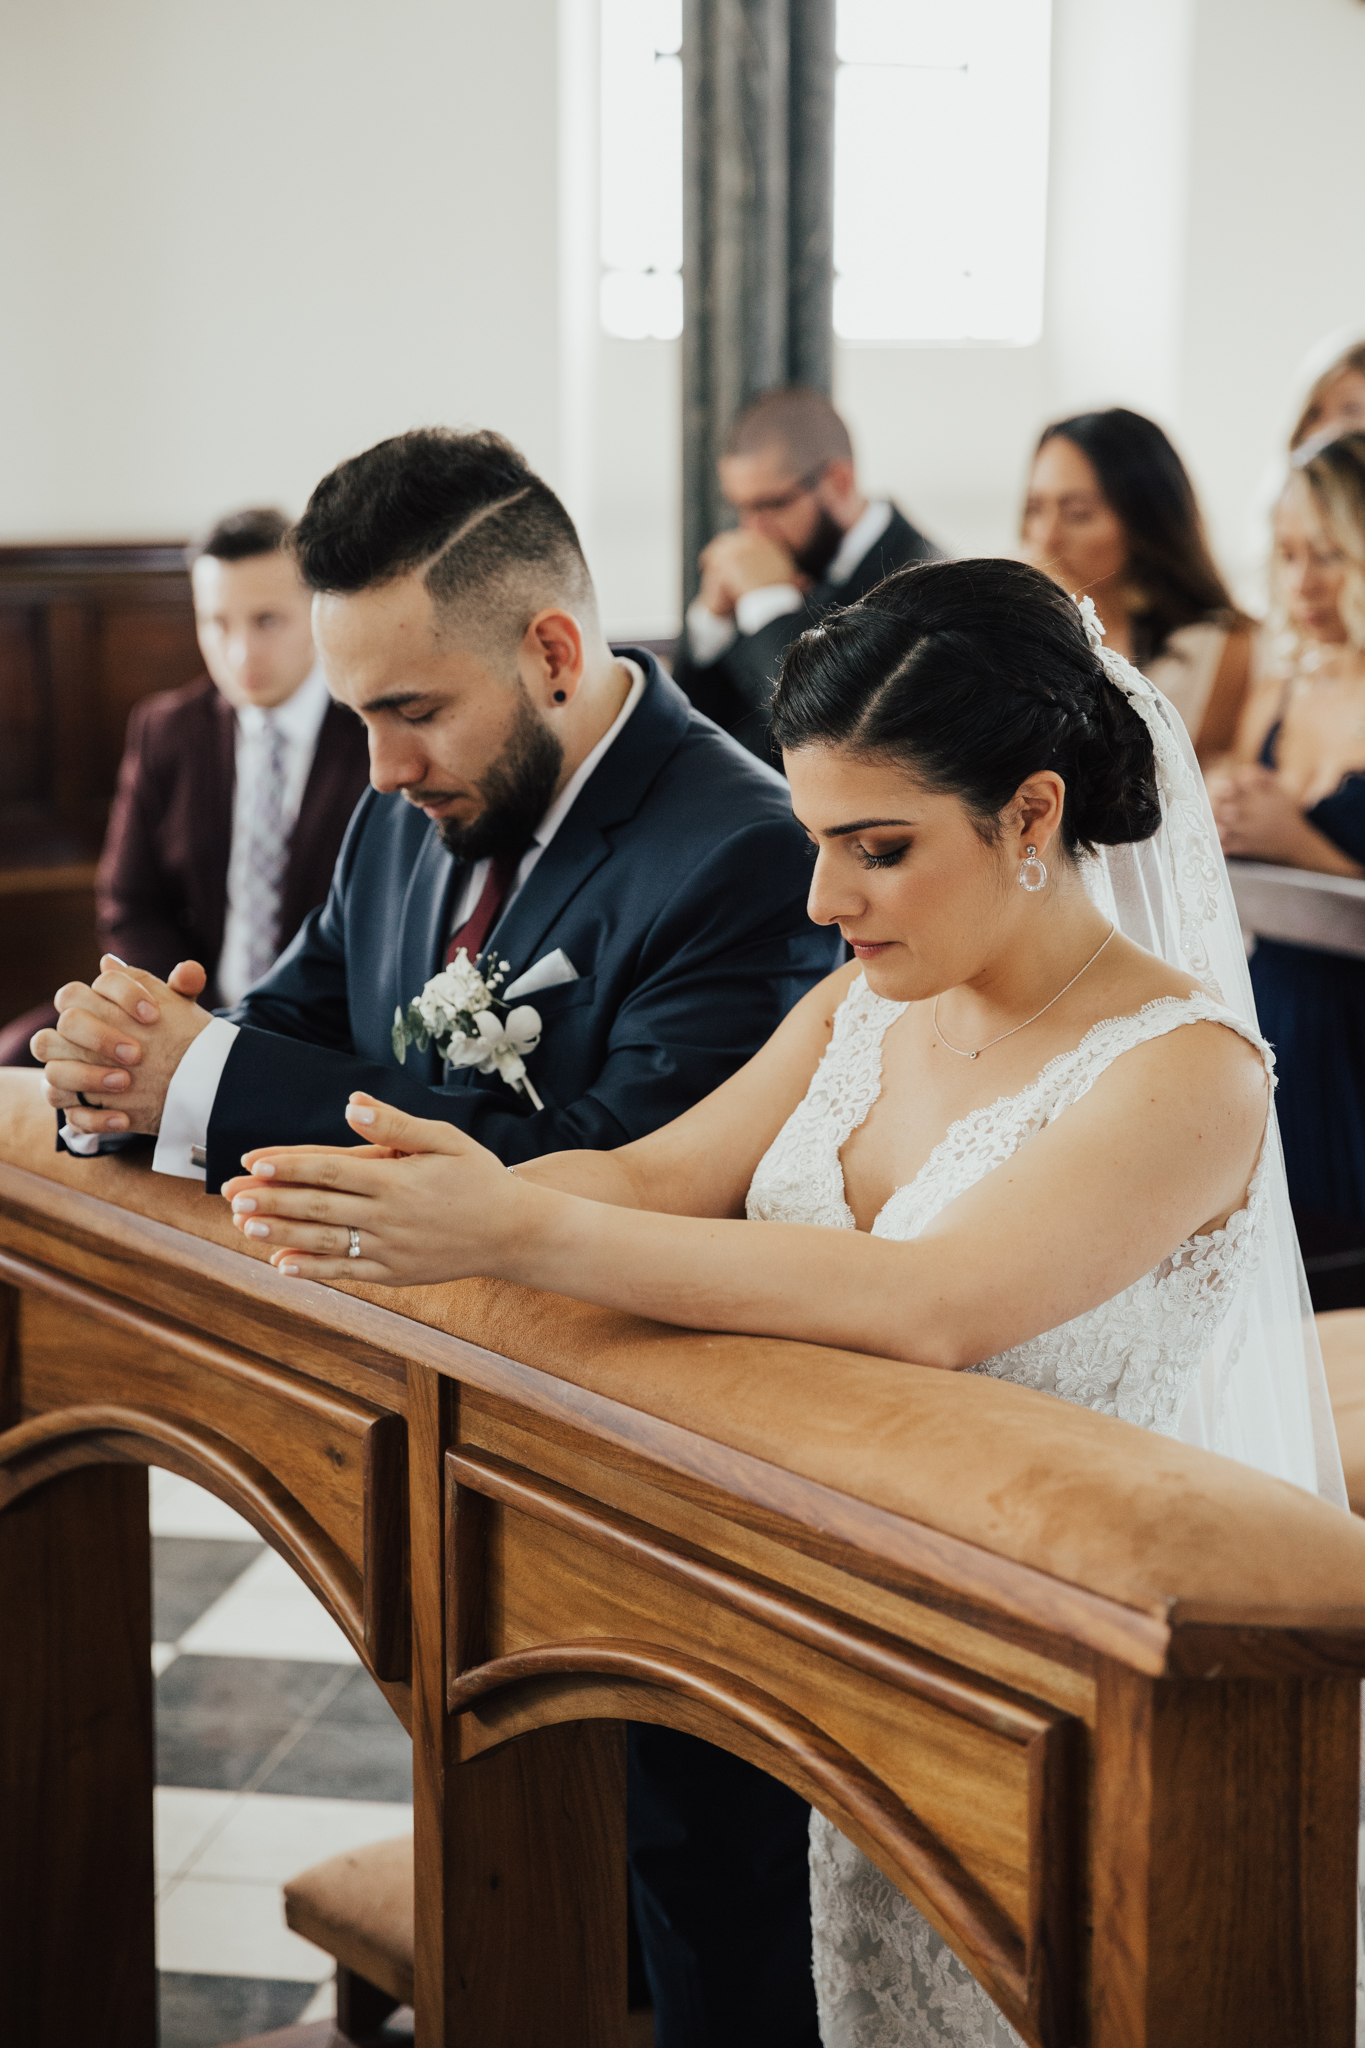 Fine art NYC wedding photography